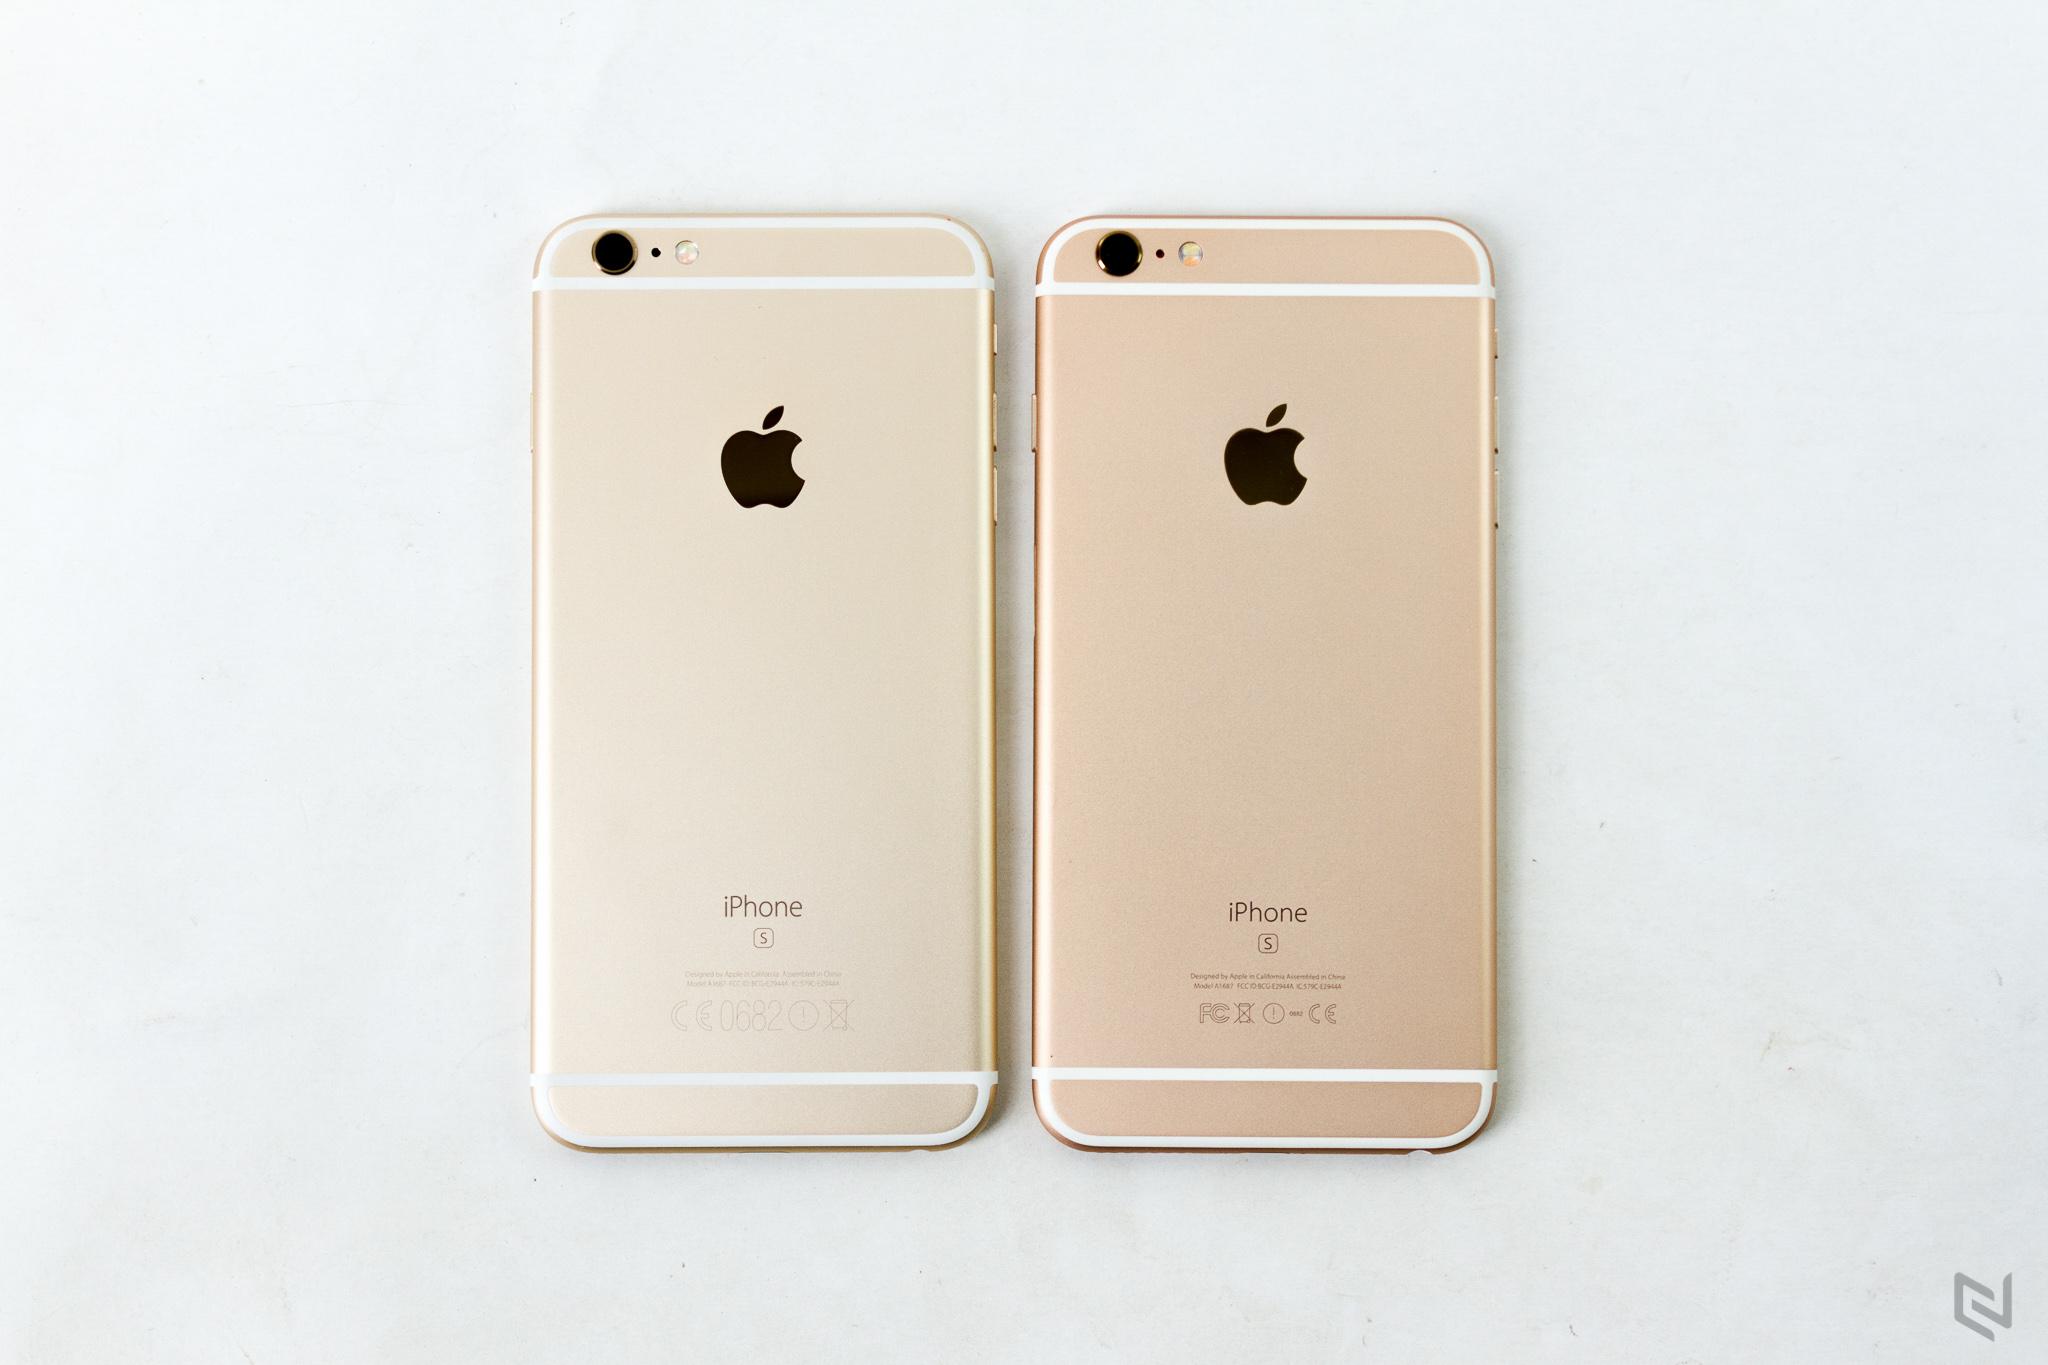 Mở hộp iPhone 6s Plus phiên bản...chạy Android